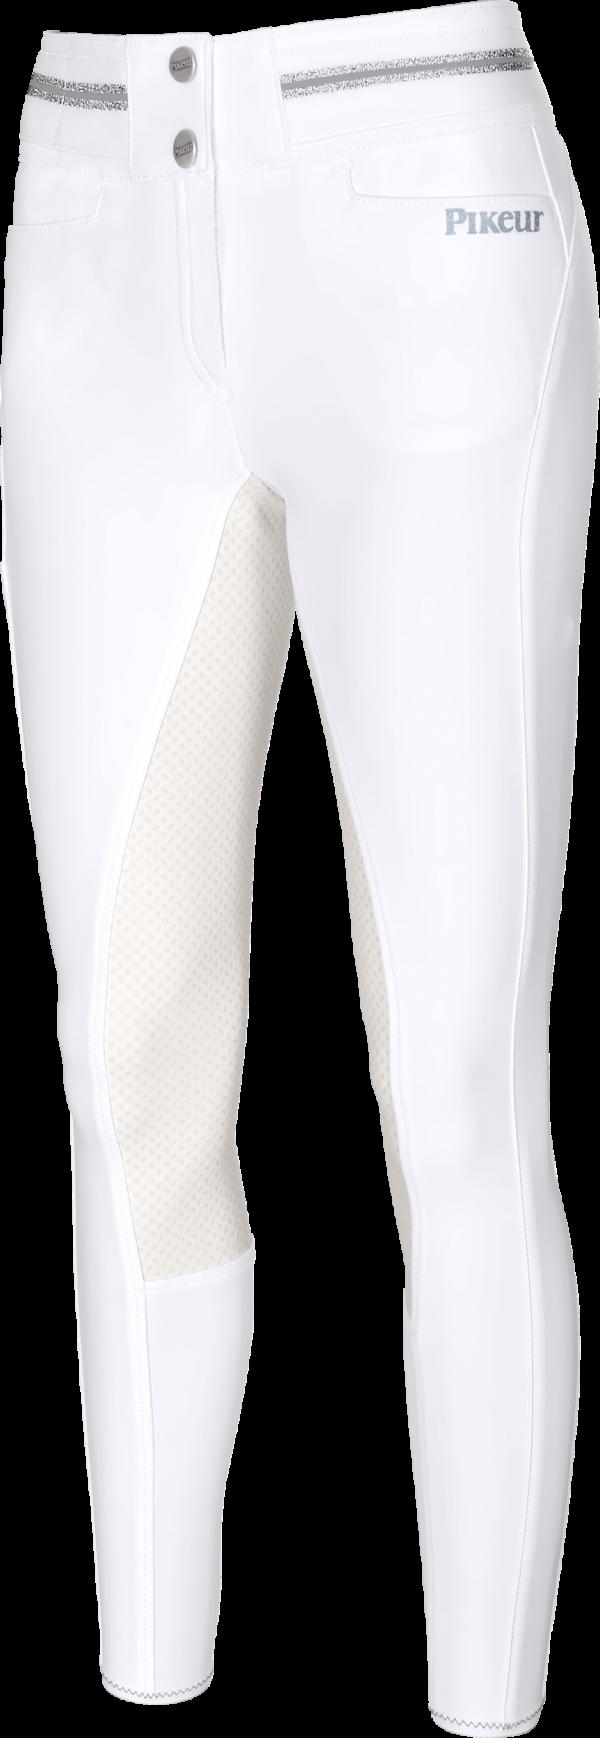 calanja grip white